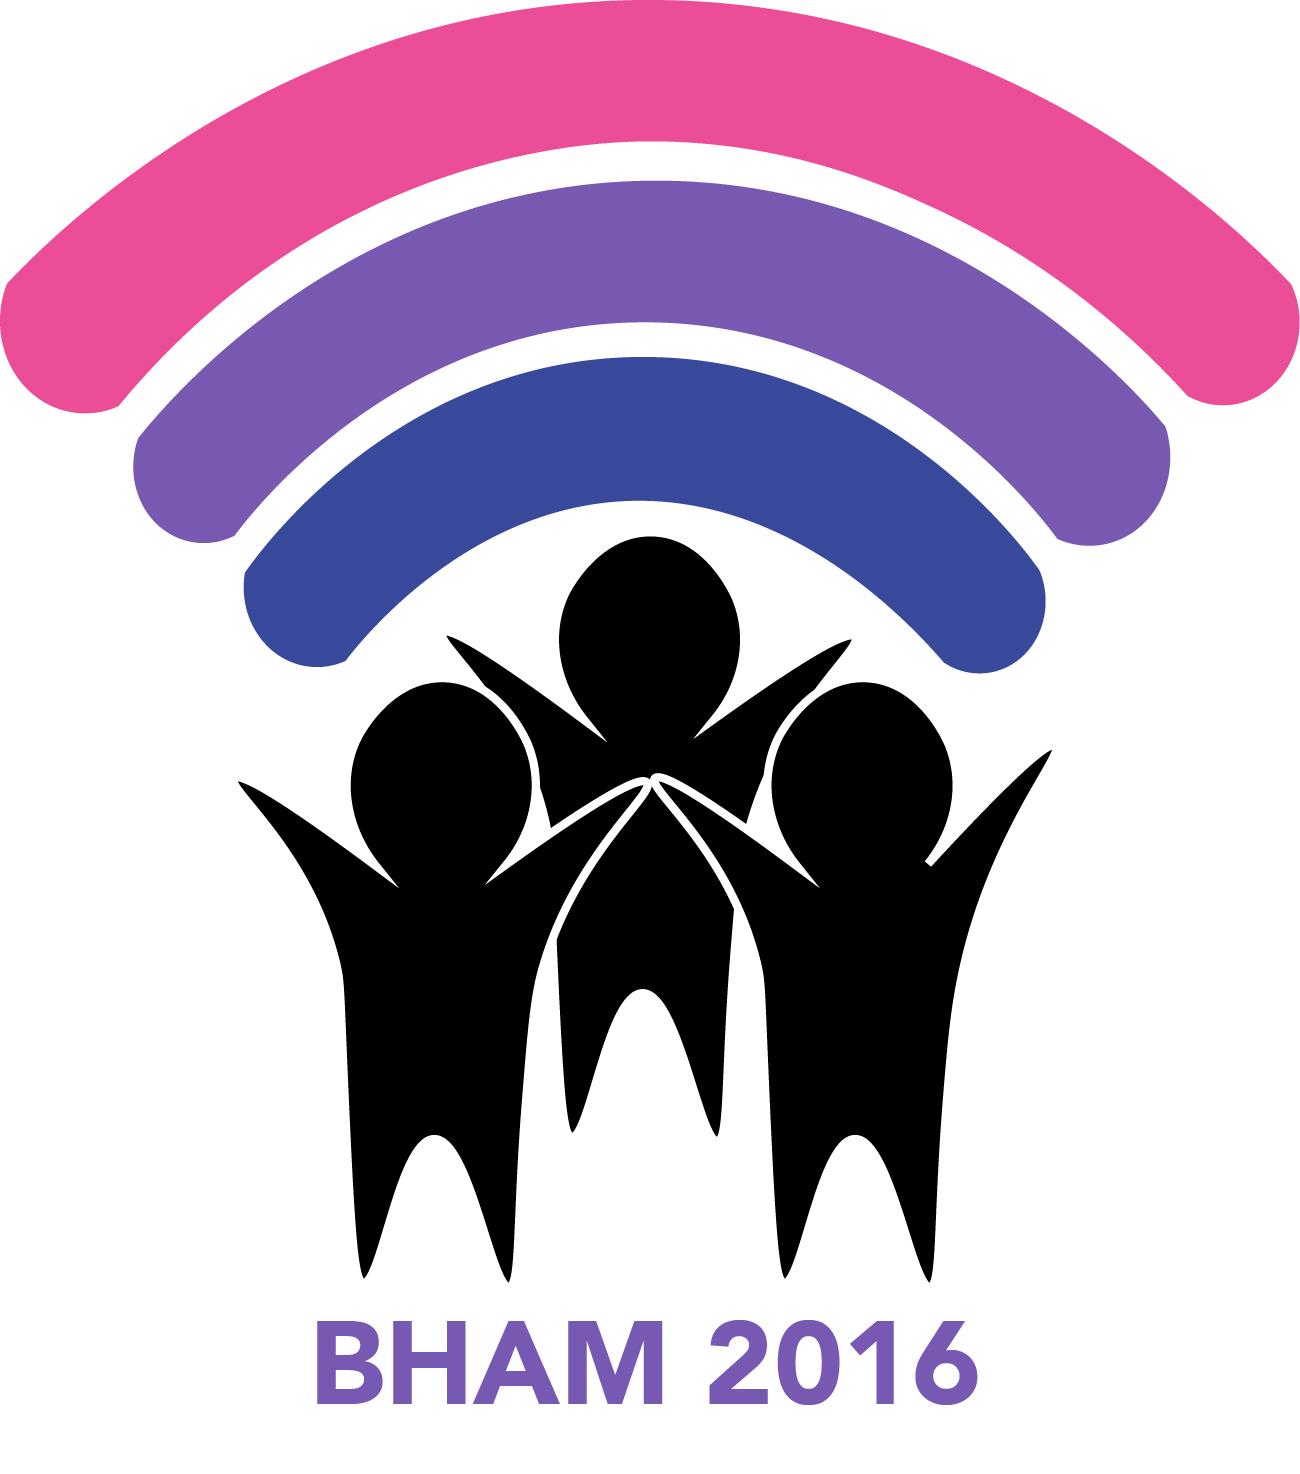 BHAM Logo with words